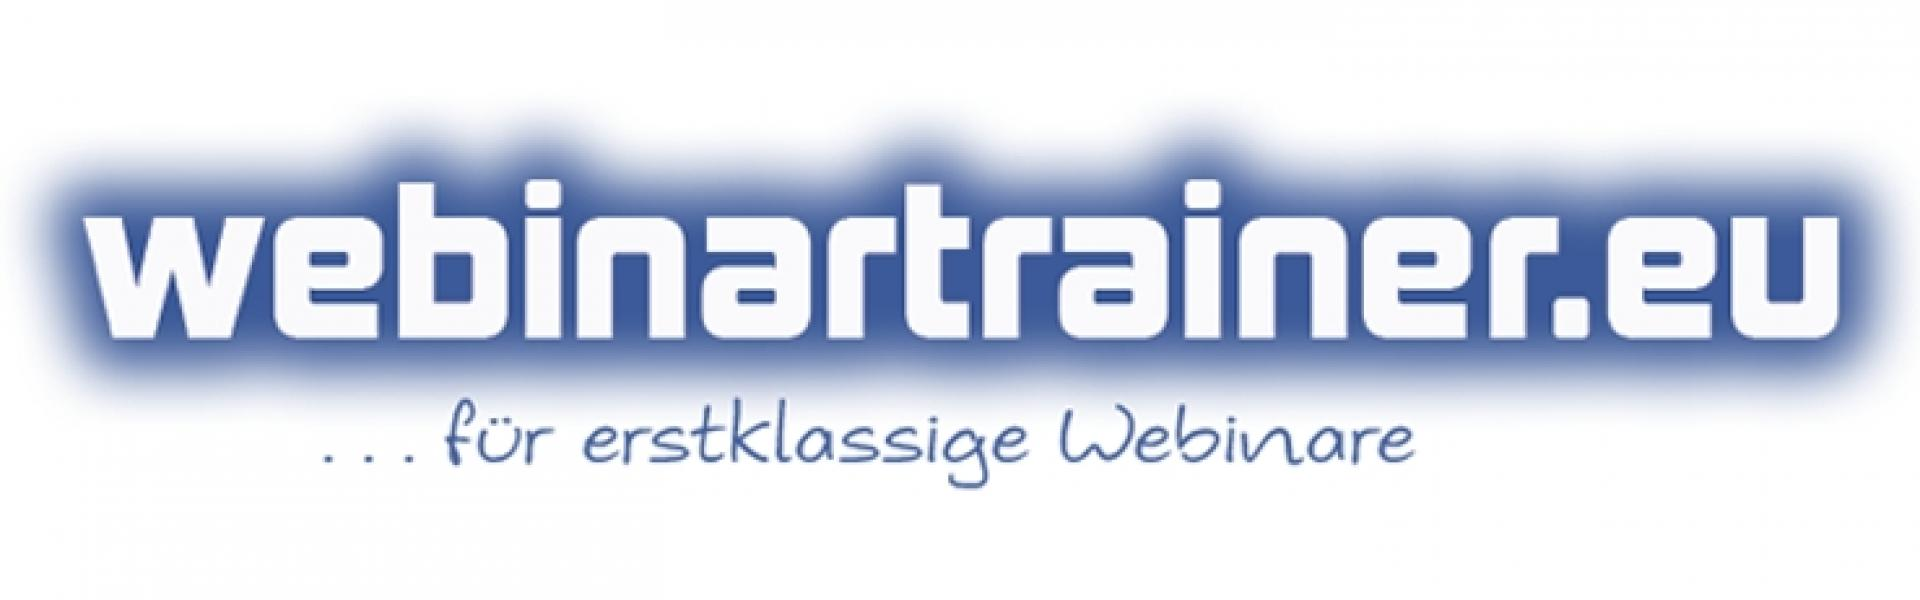 webinartrainer.eu cover